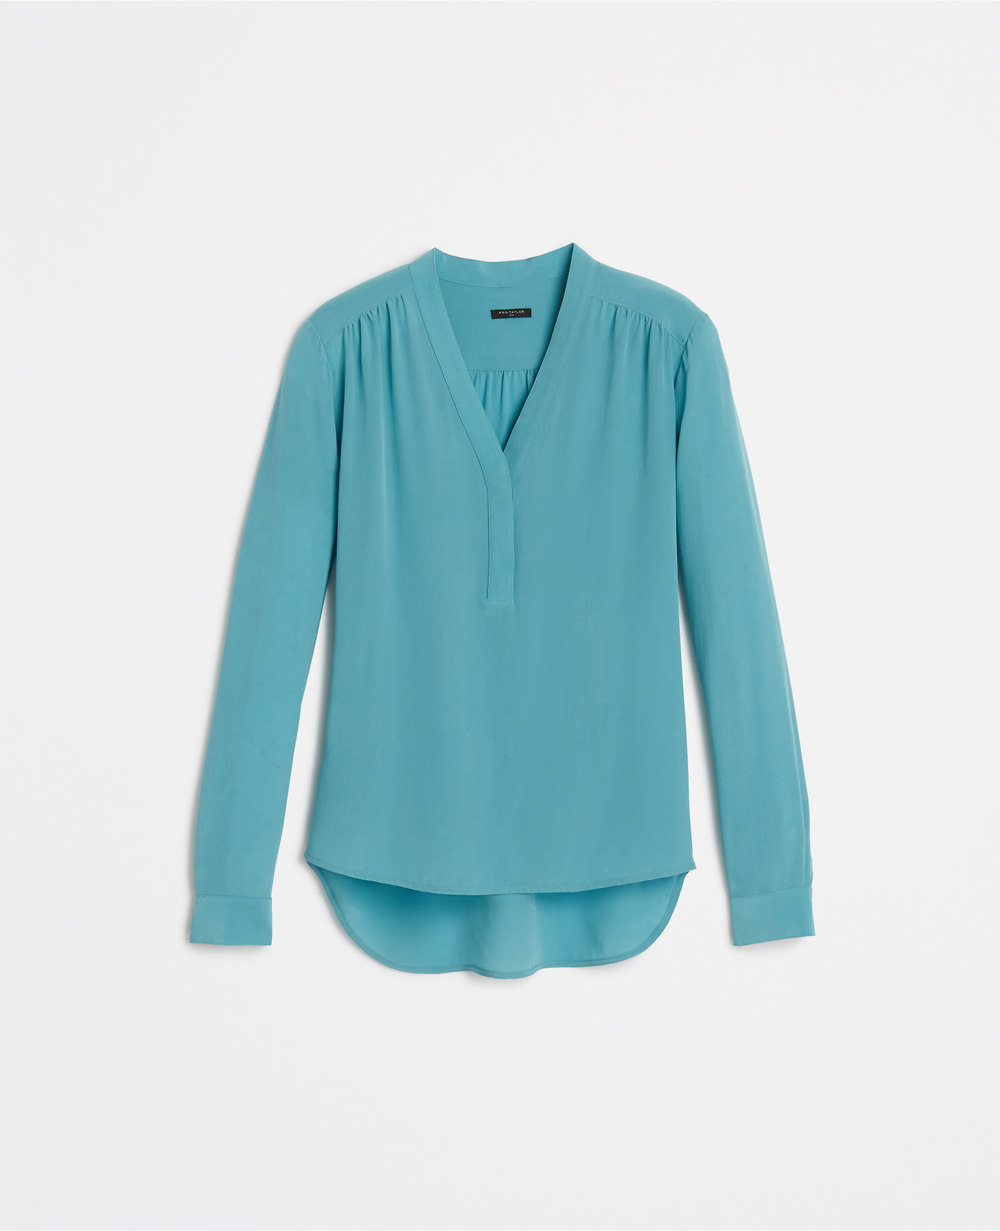 Petite V Neck Silk Blouse. Nordic Blue.Ann Taylor. $98.